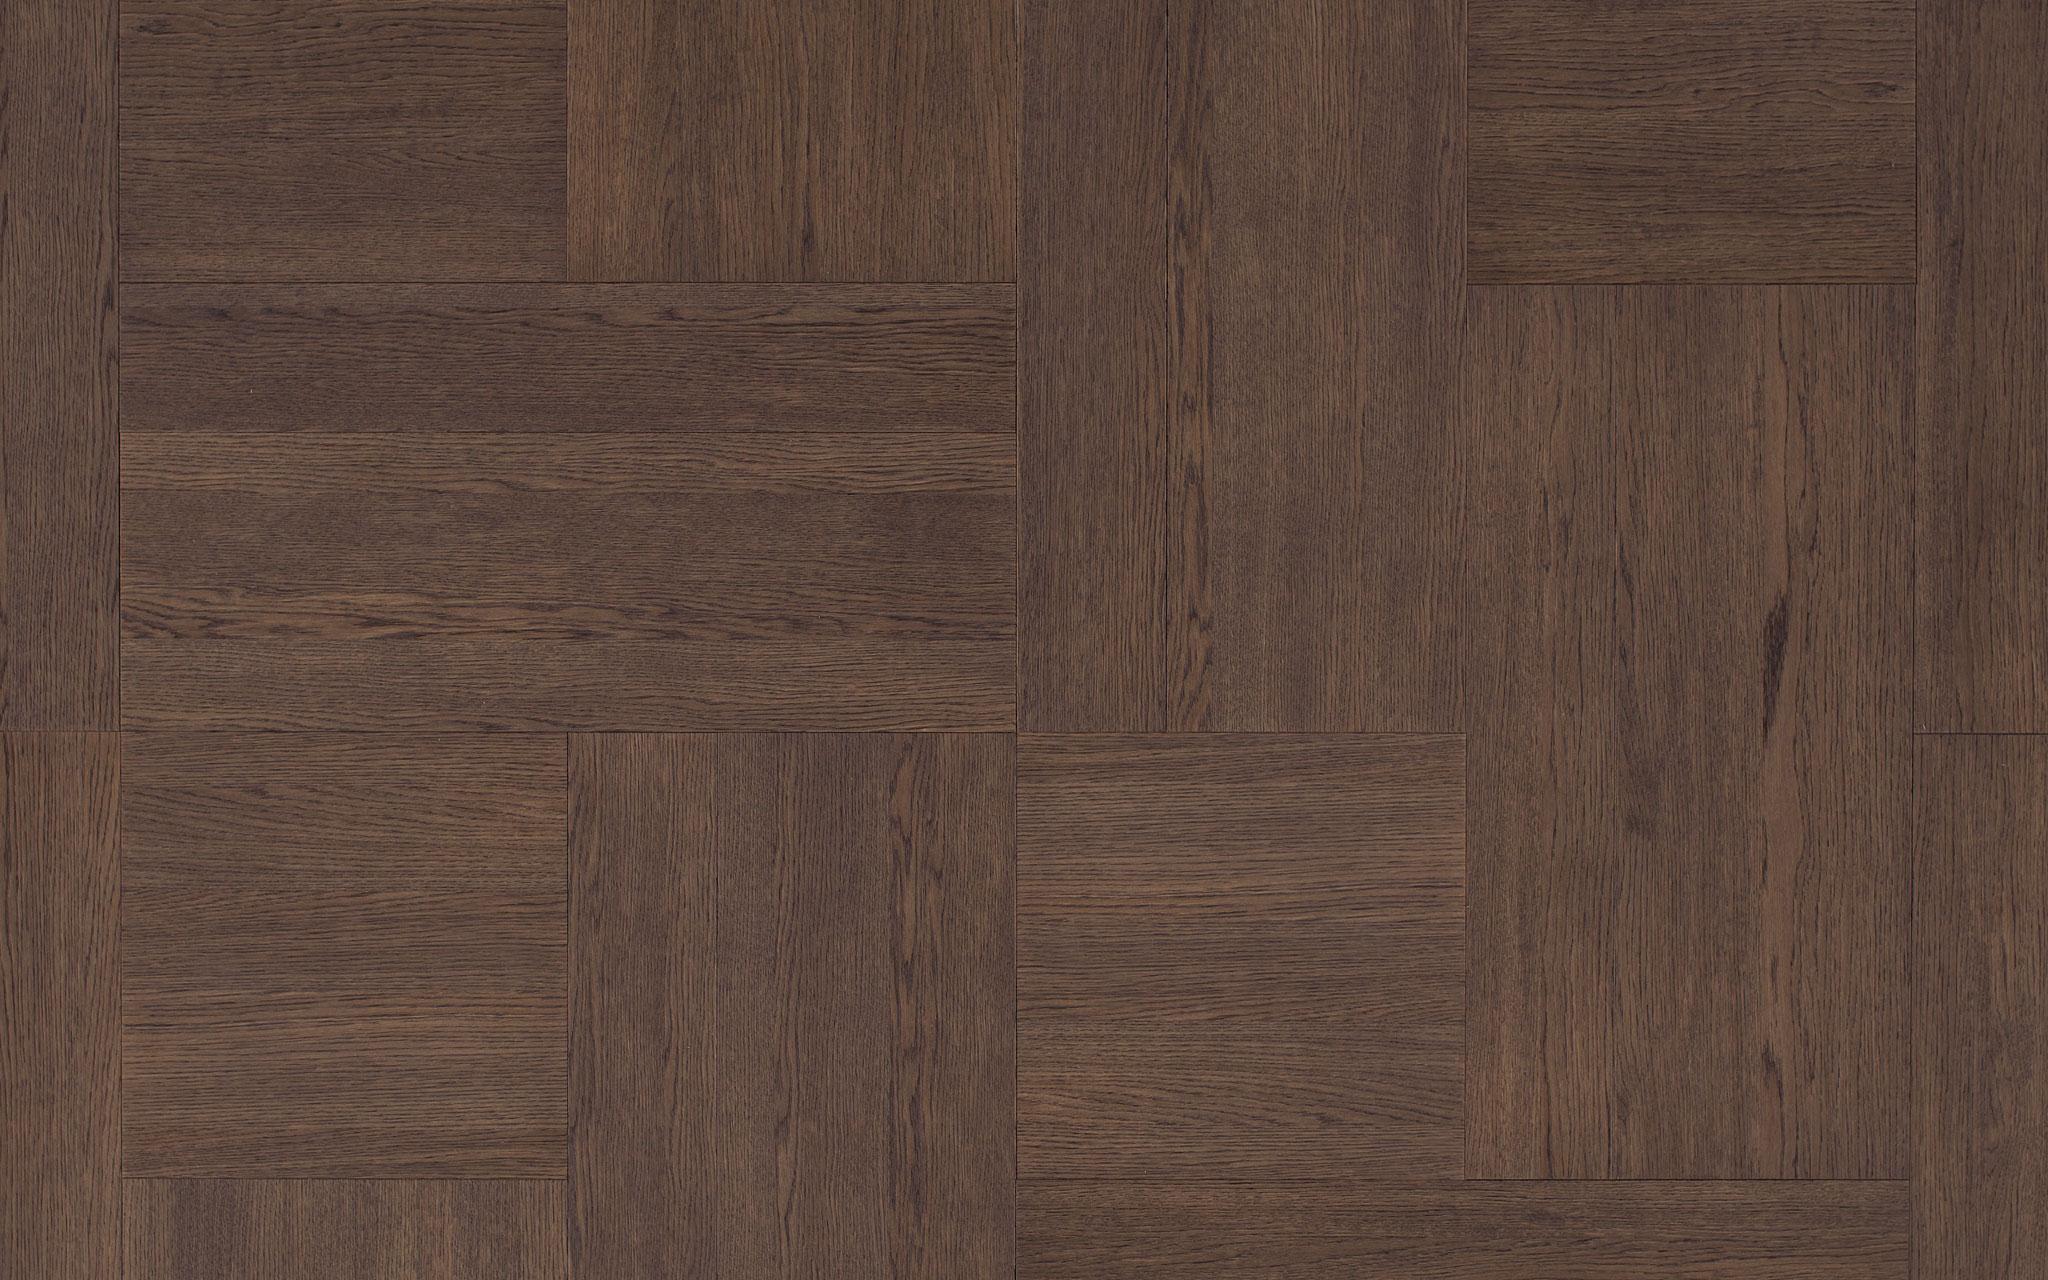 Lg Foxtrot Tortora Marble Trend Marble Granite Tiles